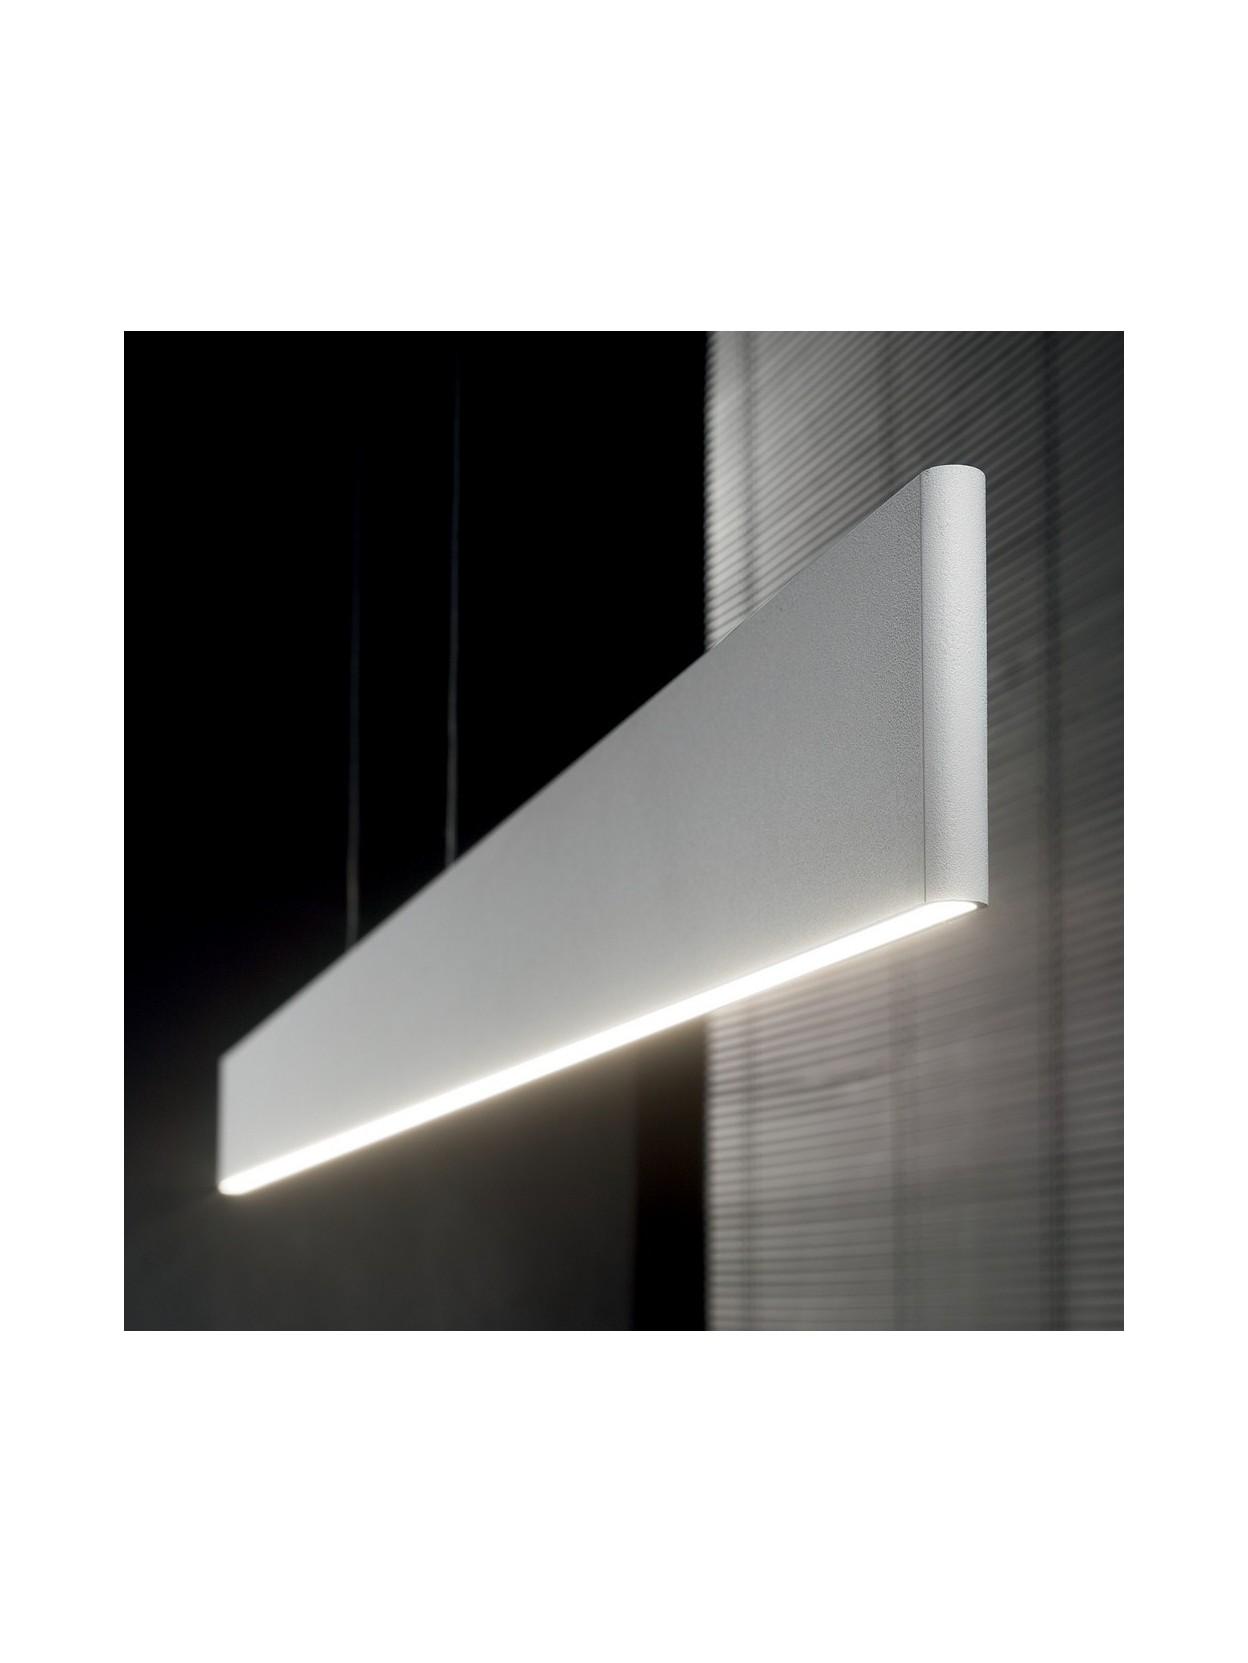 Lampadario a led moderno bianco desk for Lampadario moderno led